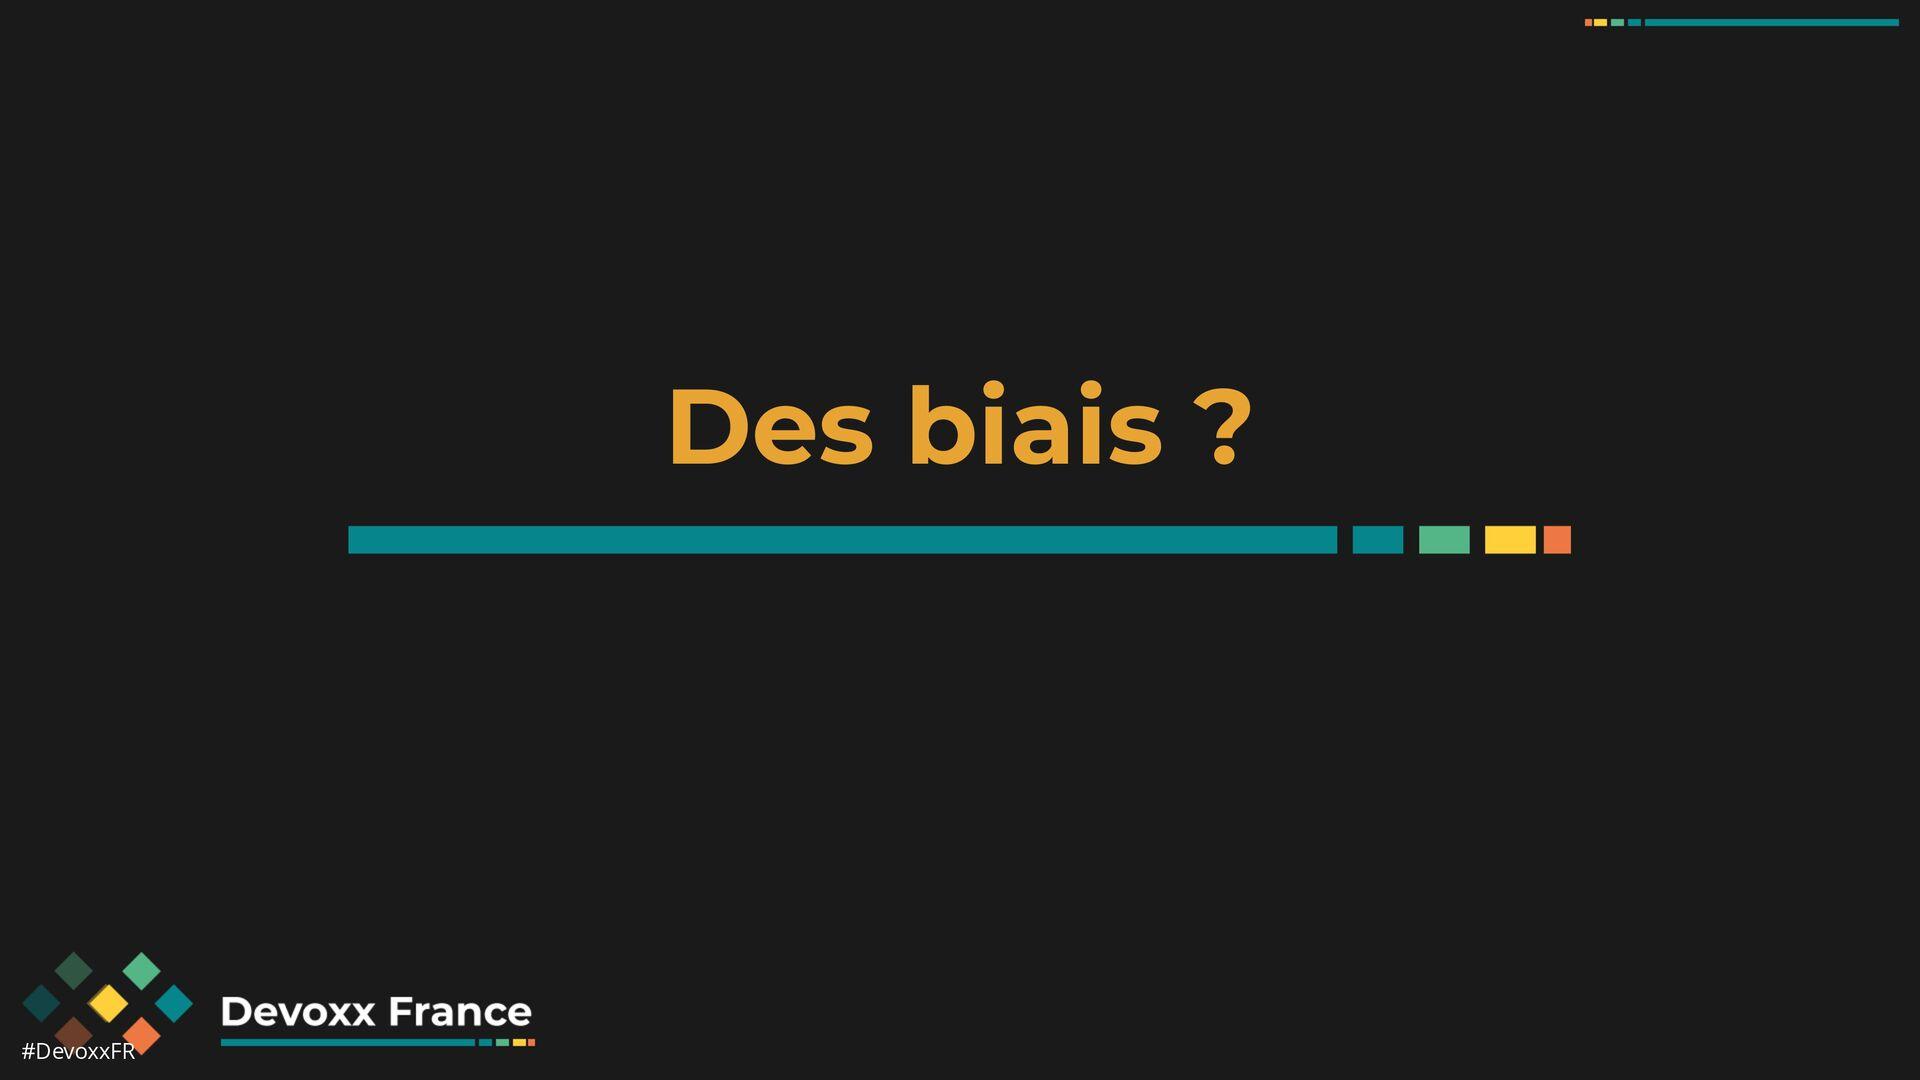 #DevoxxFR Des biais ?